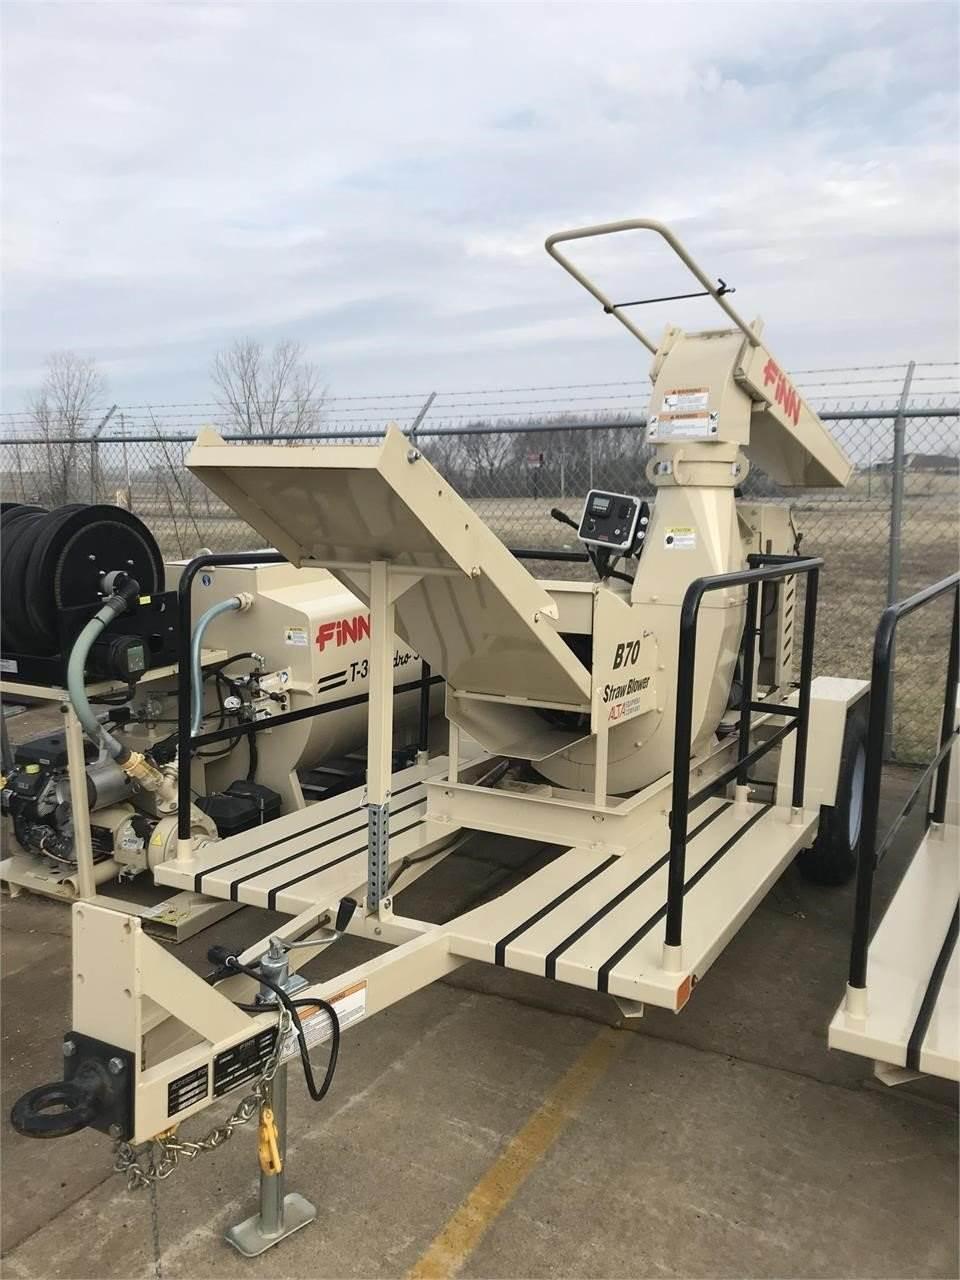 Finn B70T, Farm Drills, Agriculture